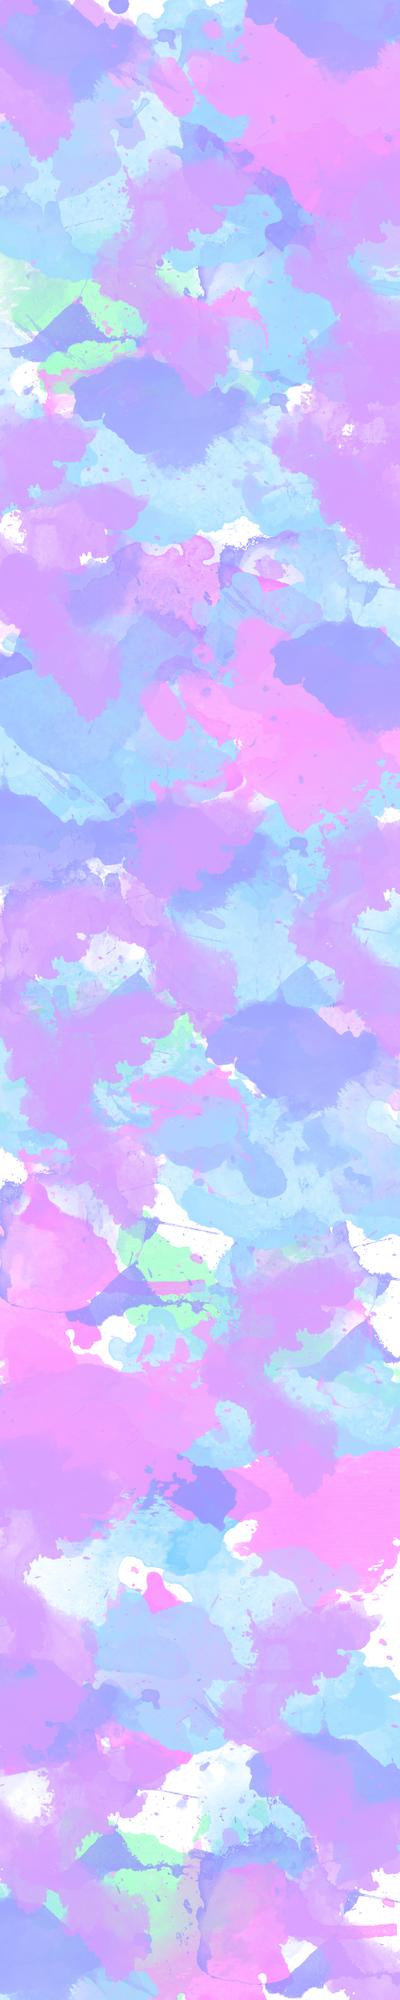 Pastel Watercolor Custom Box Background (FREE) by frostykat13